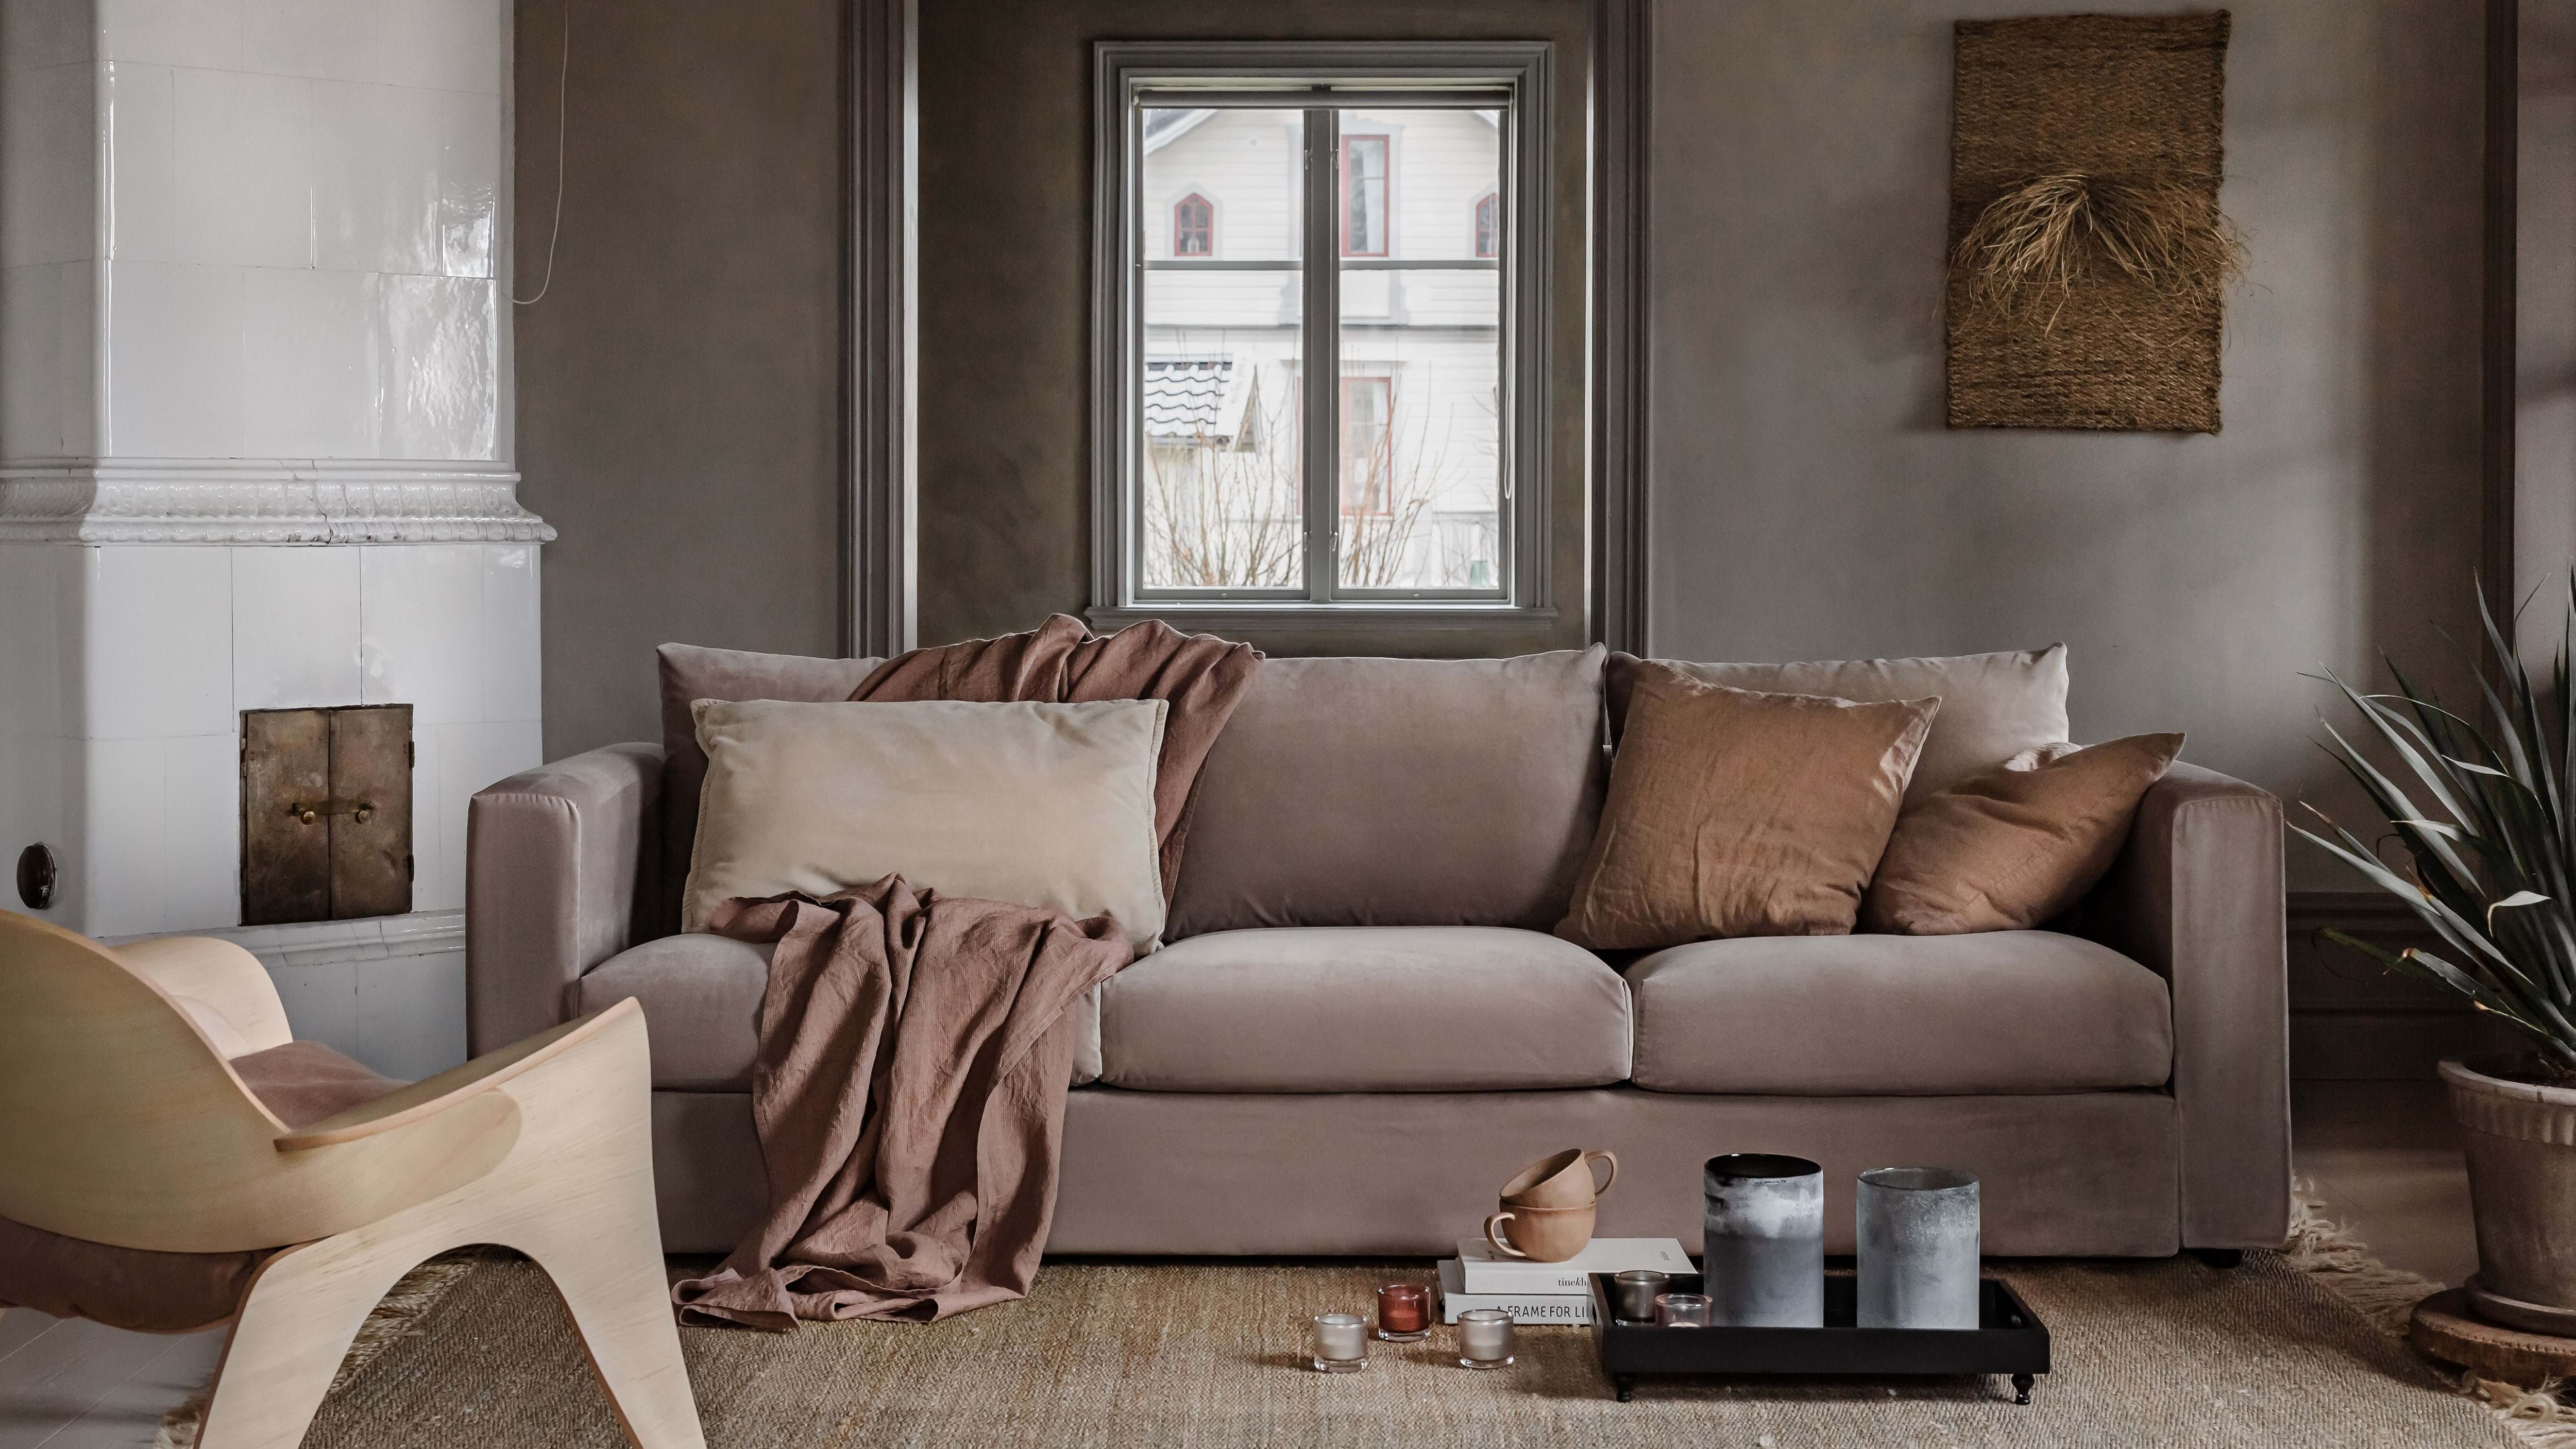 IKEA Vimle sofa review by Bemz Bemz in 2020 Ikea vimle